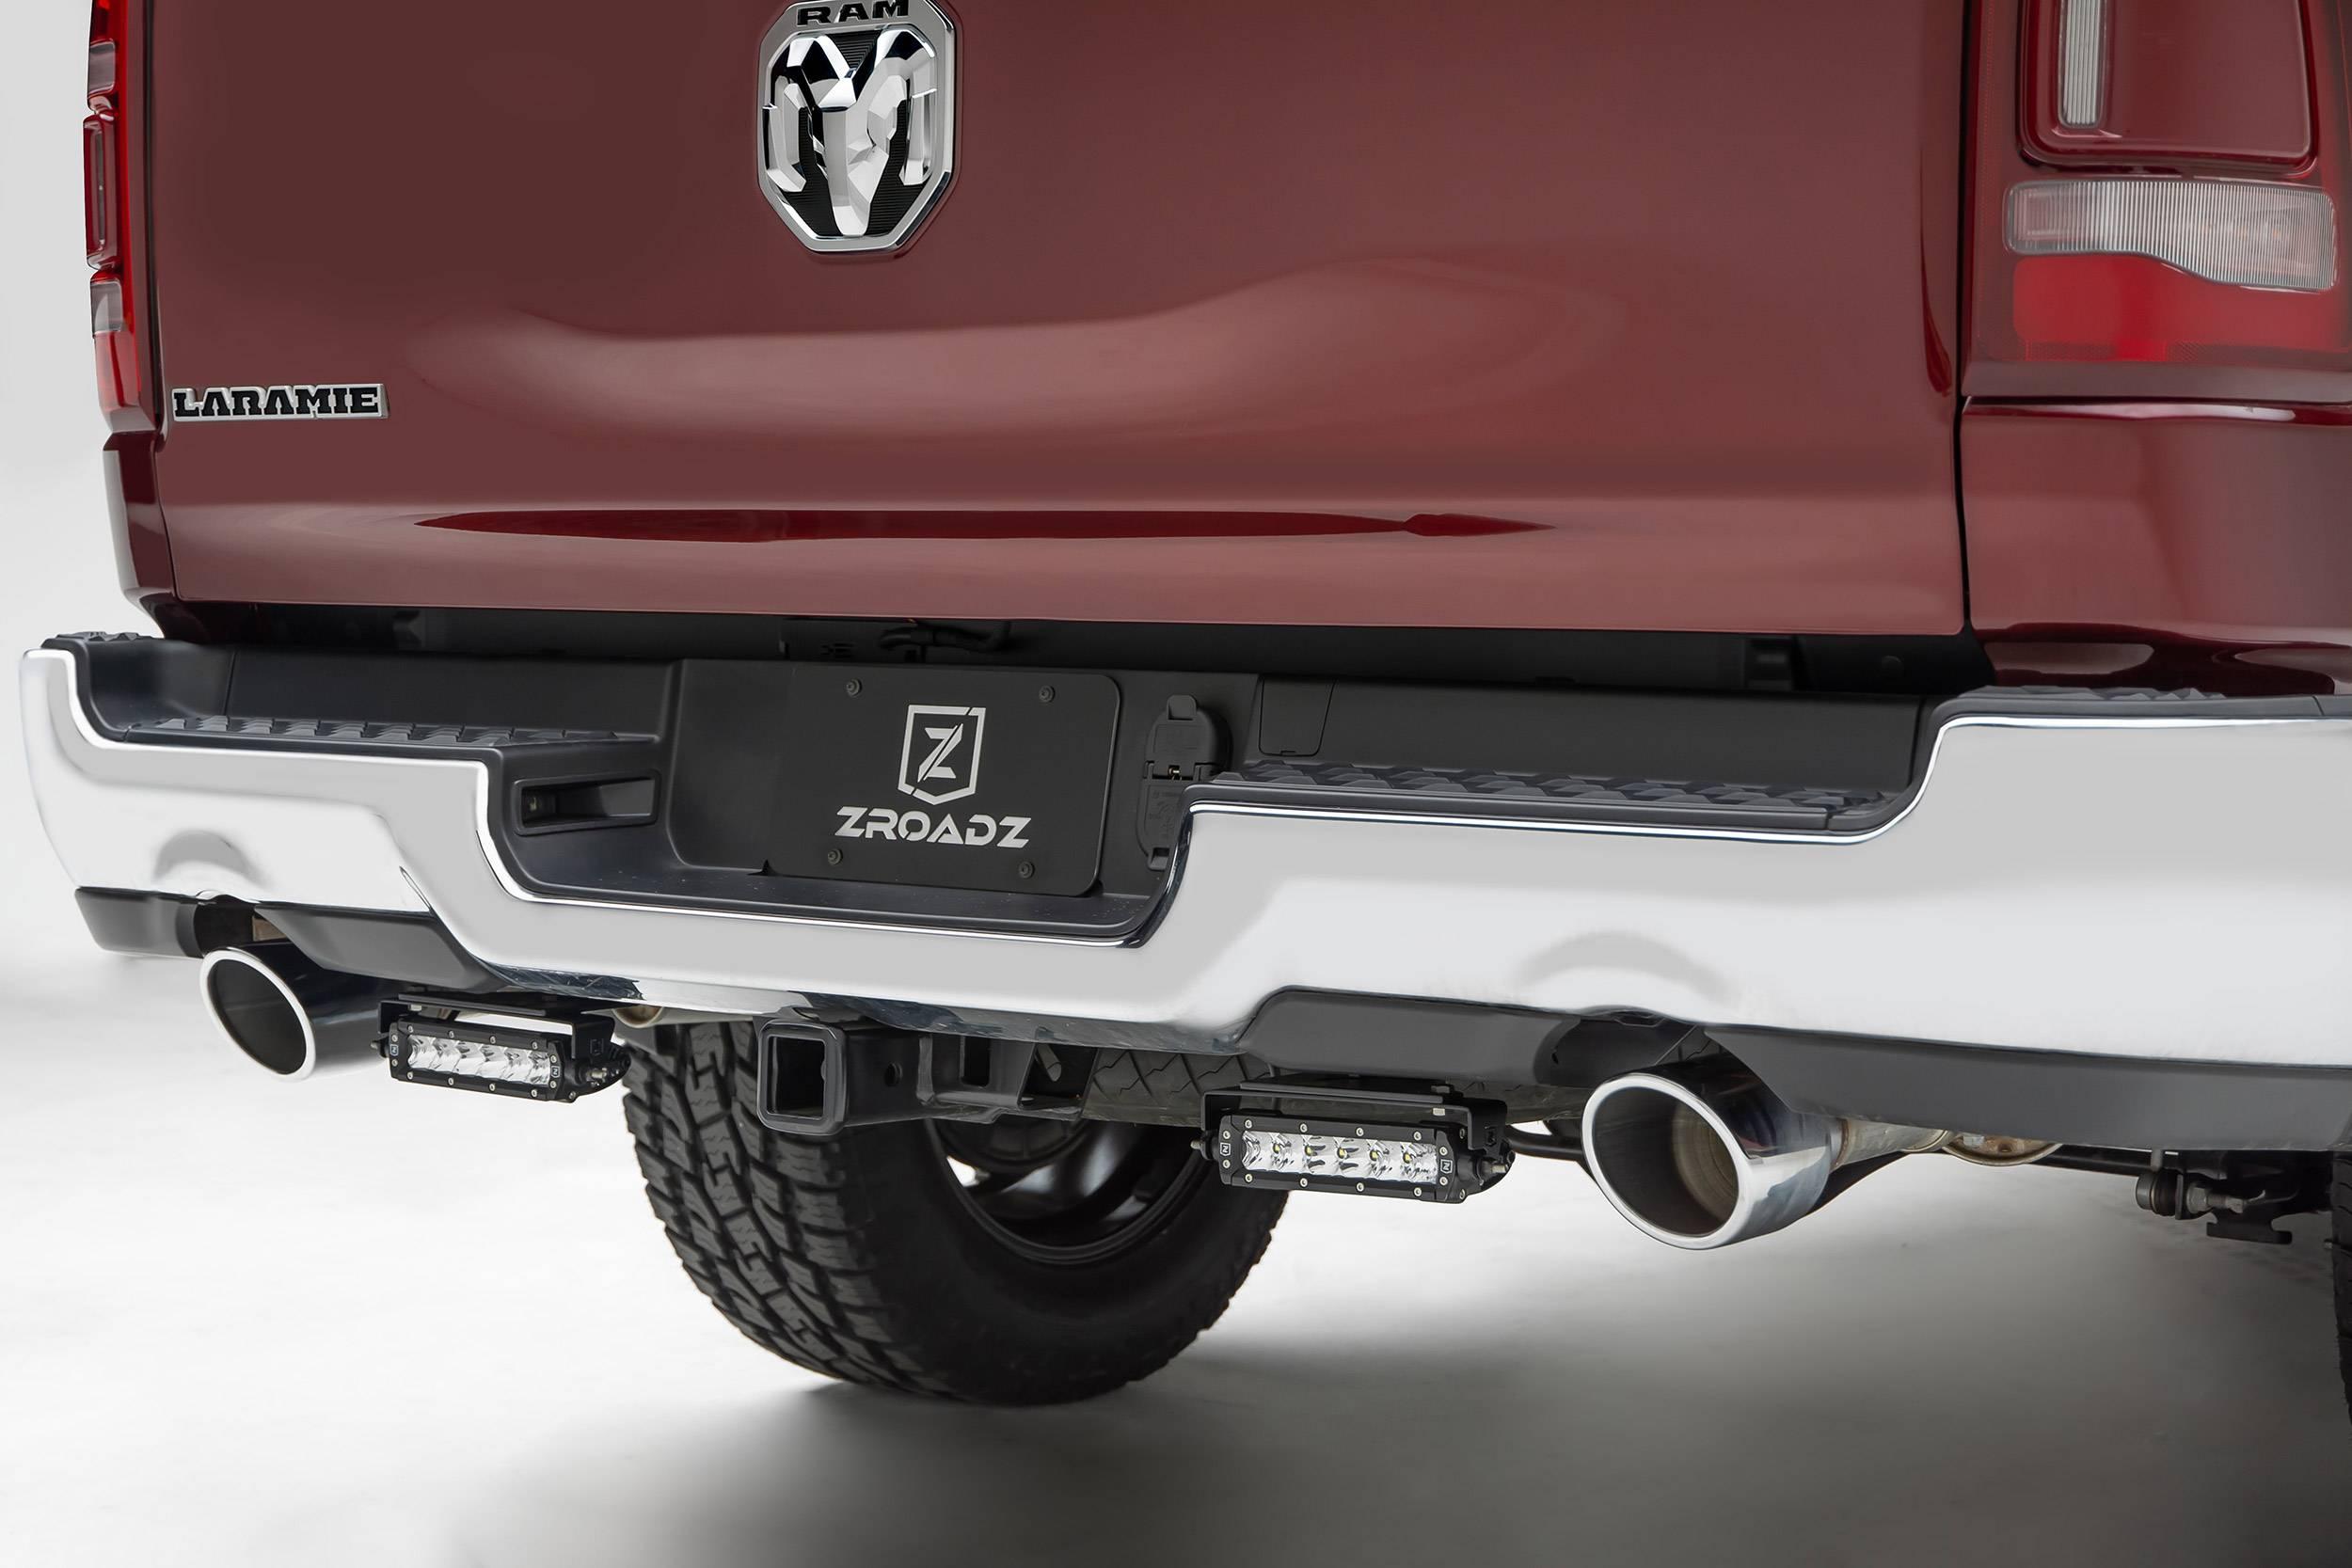 ZROADZ                                             - 2019-2021 Ram 1500 Rear Bumper LED Bracket to mount (2) 6 Inch Straight Single Row Light Bar - PN #Z384821